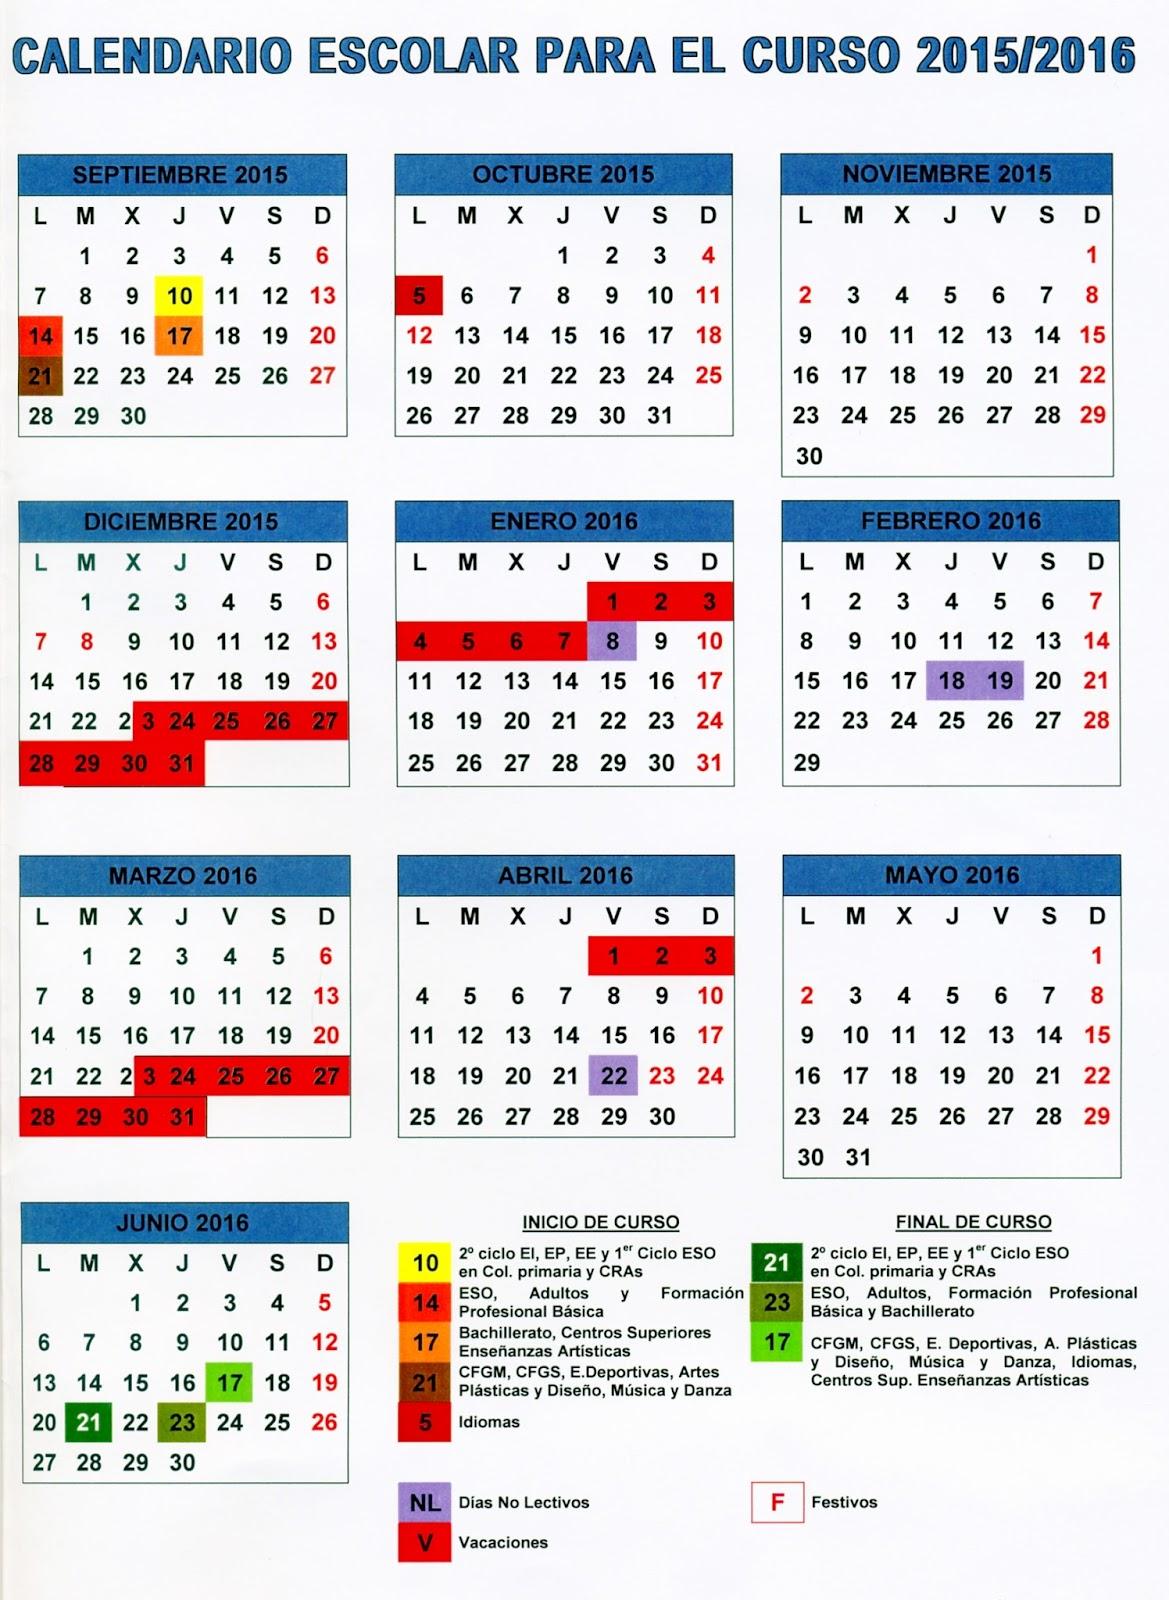 Aragon Calendario Escolar.Aragon Calendario Escolar